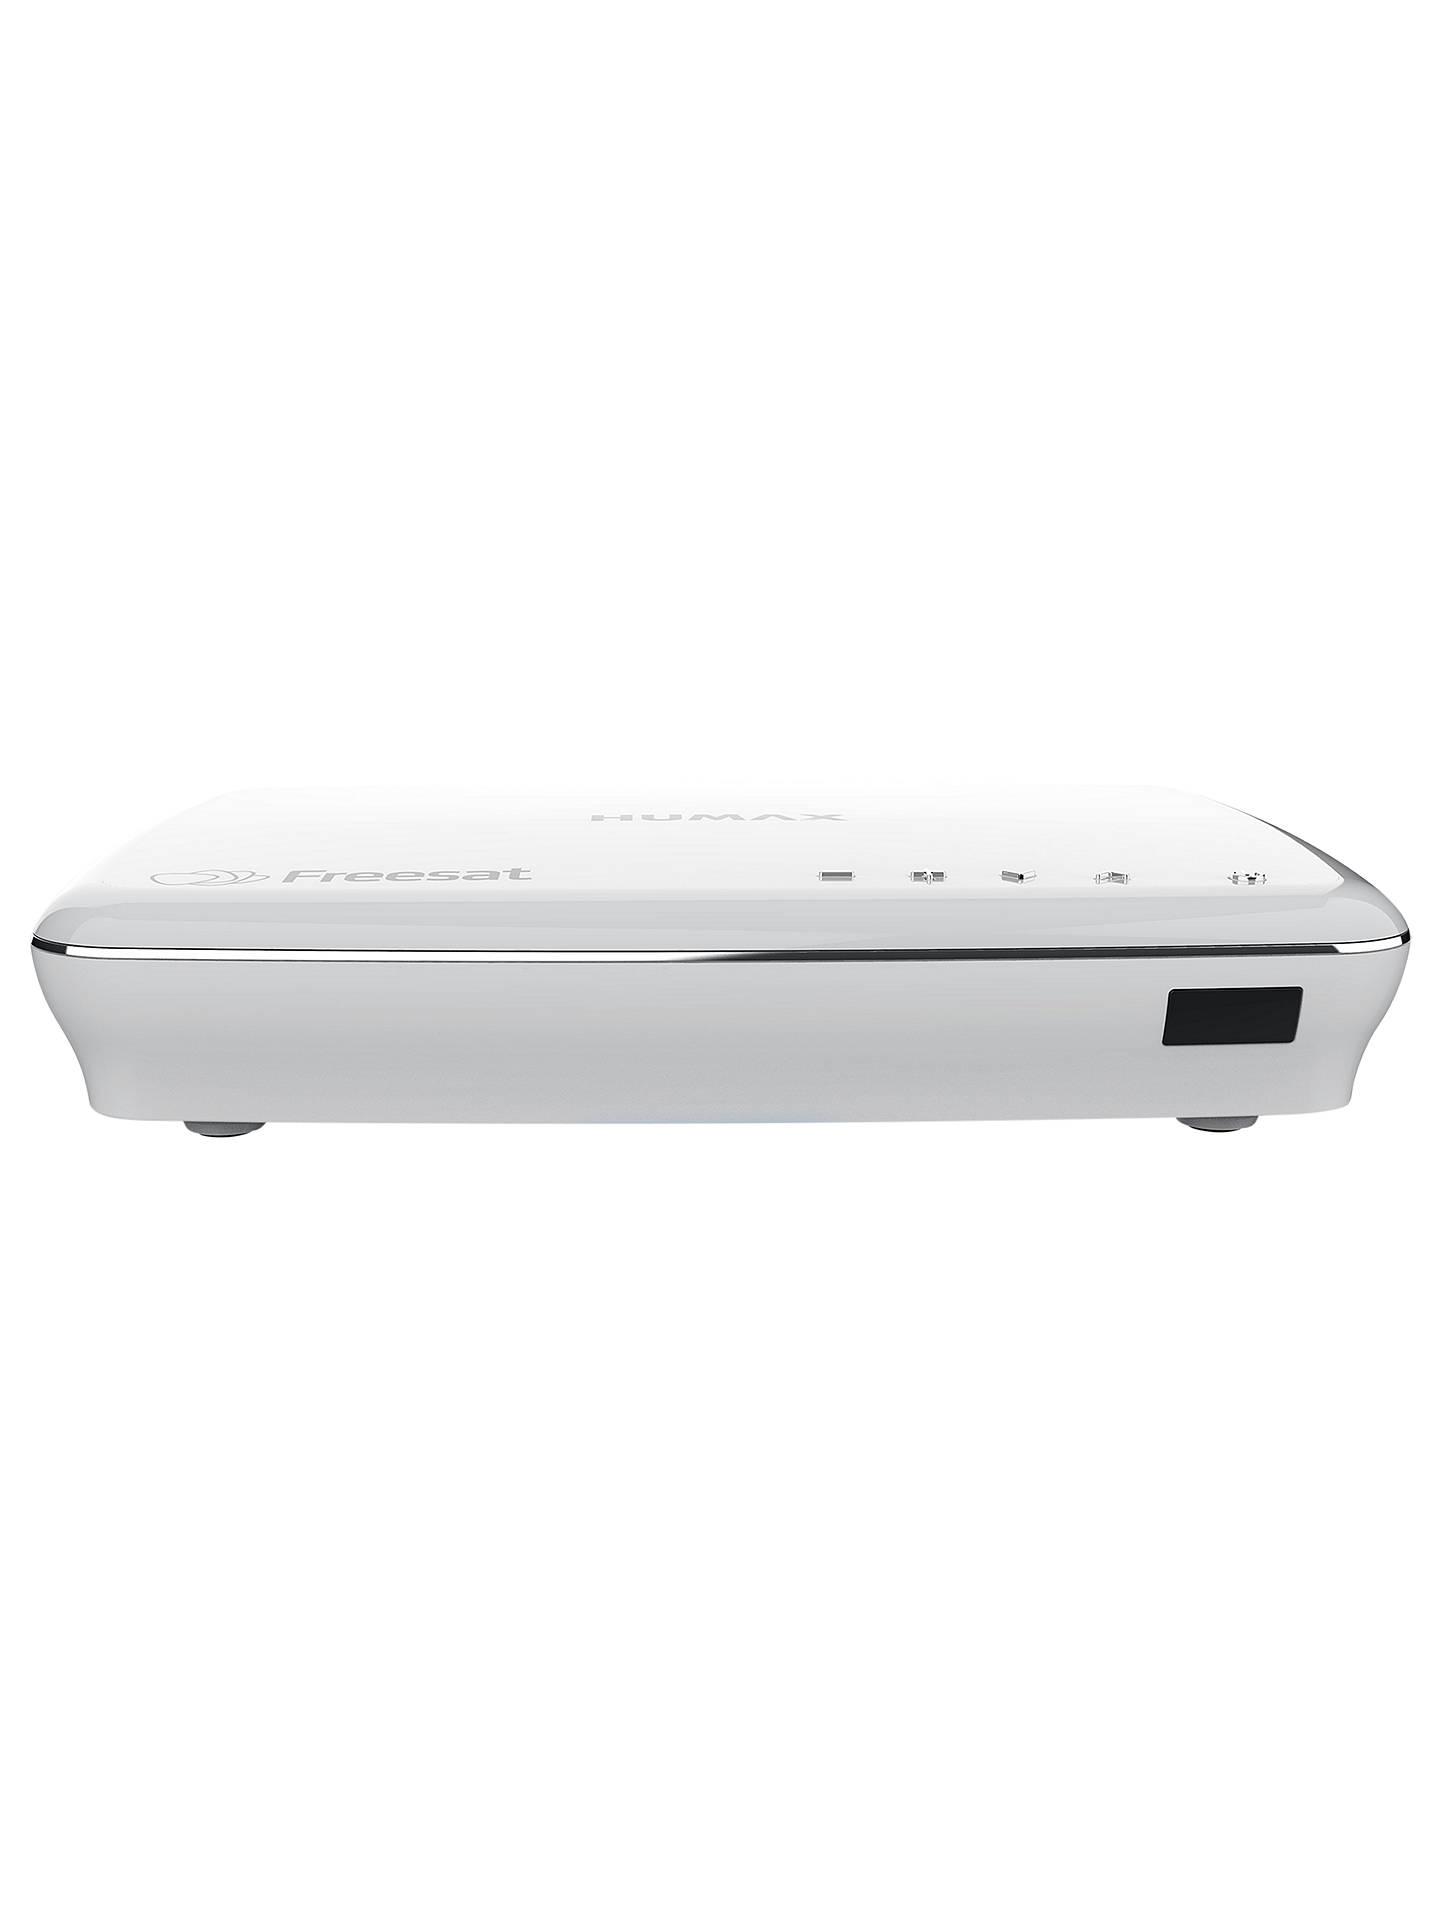 Humax HDR-1100S Smart 500GB Freesat Digital TV Recorder, White